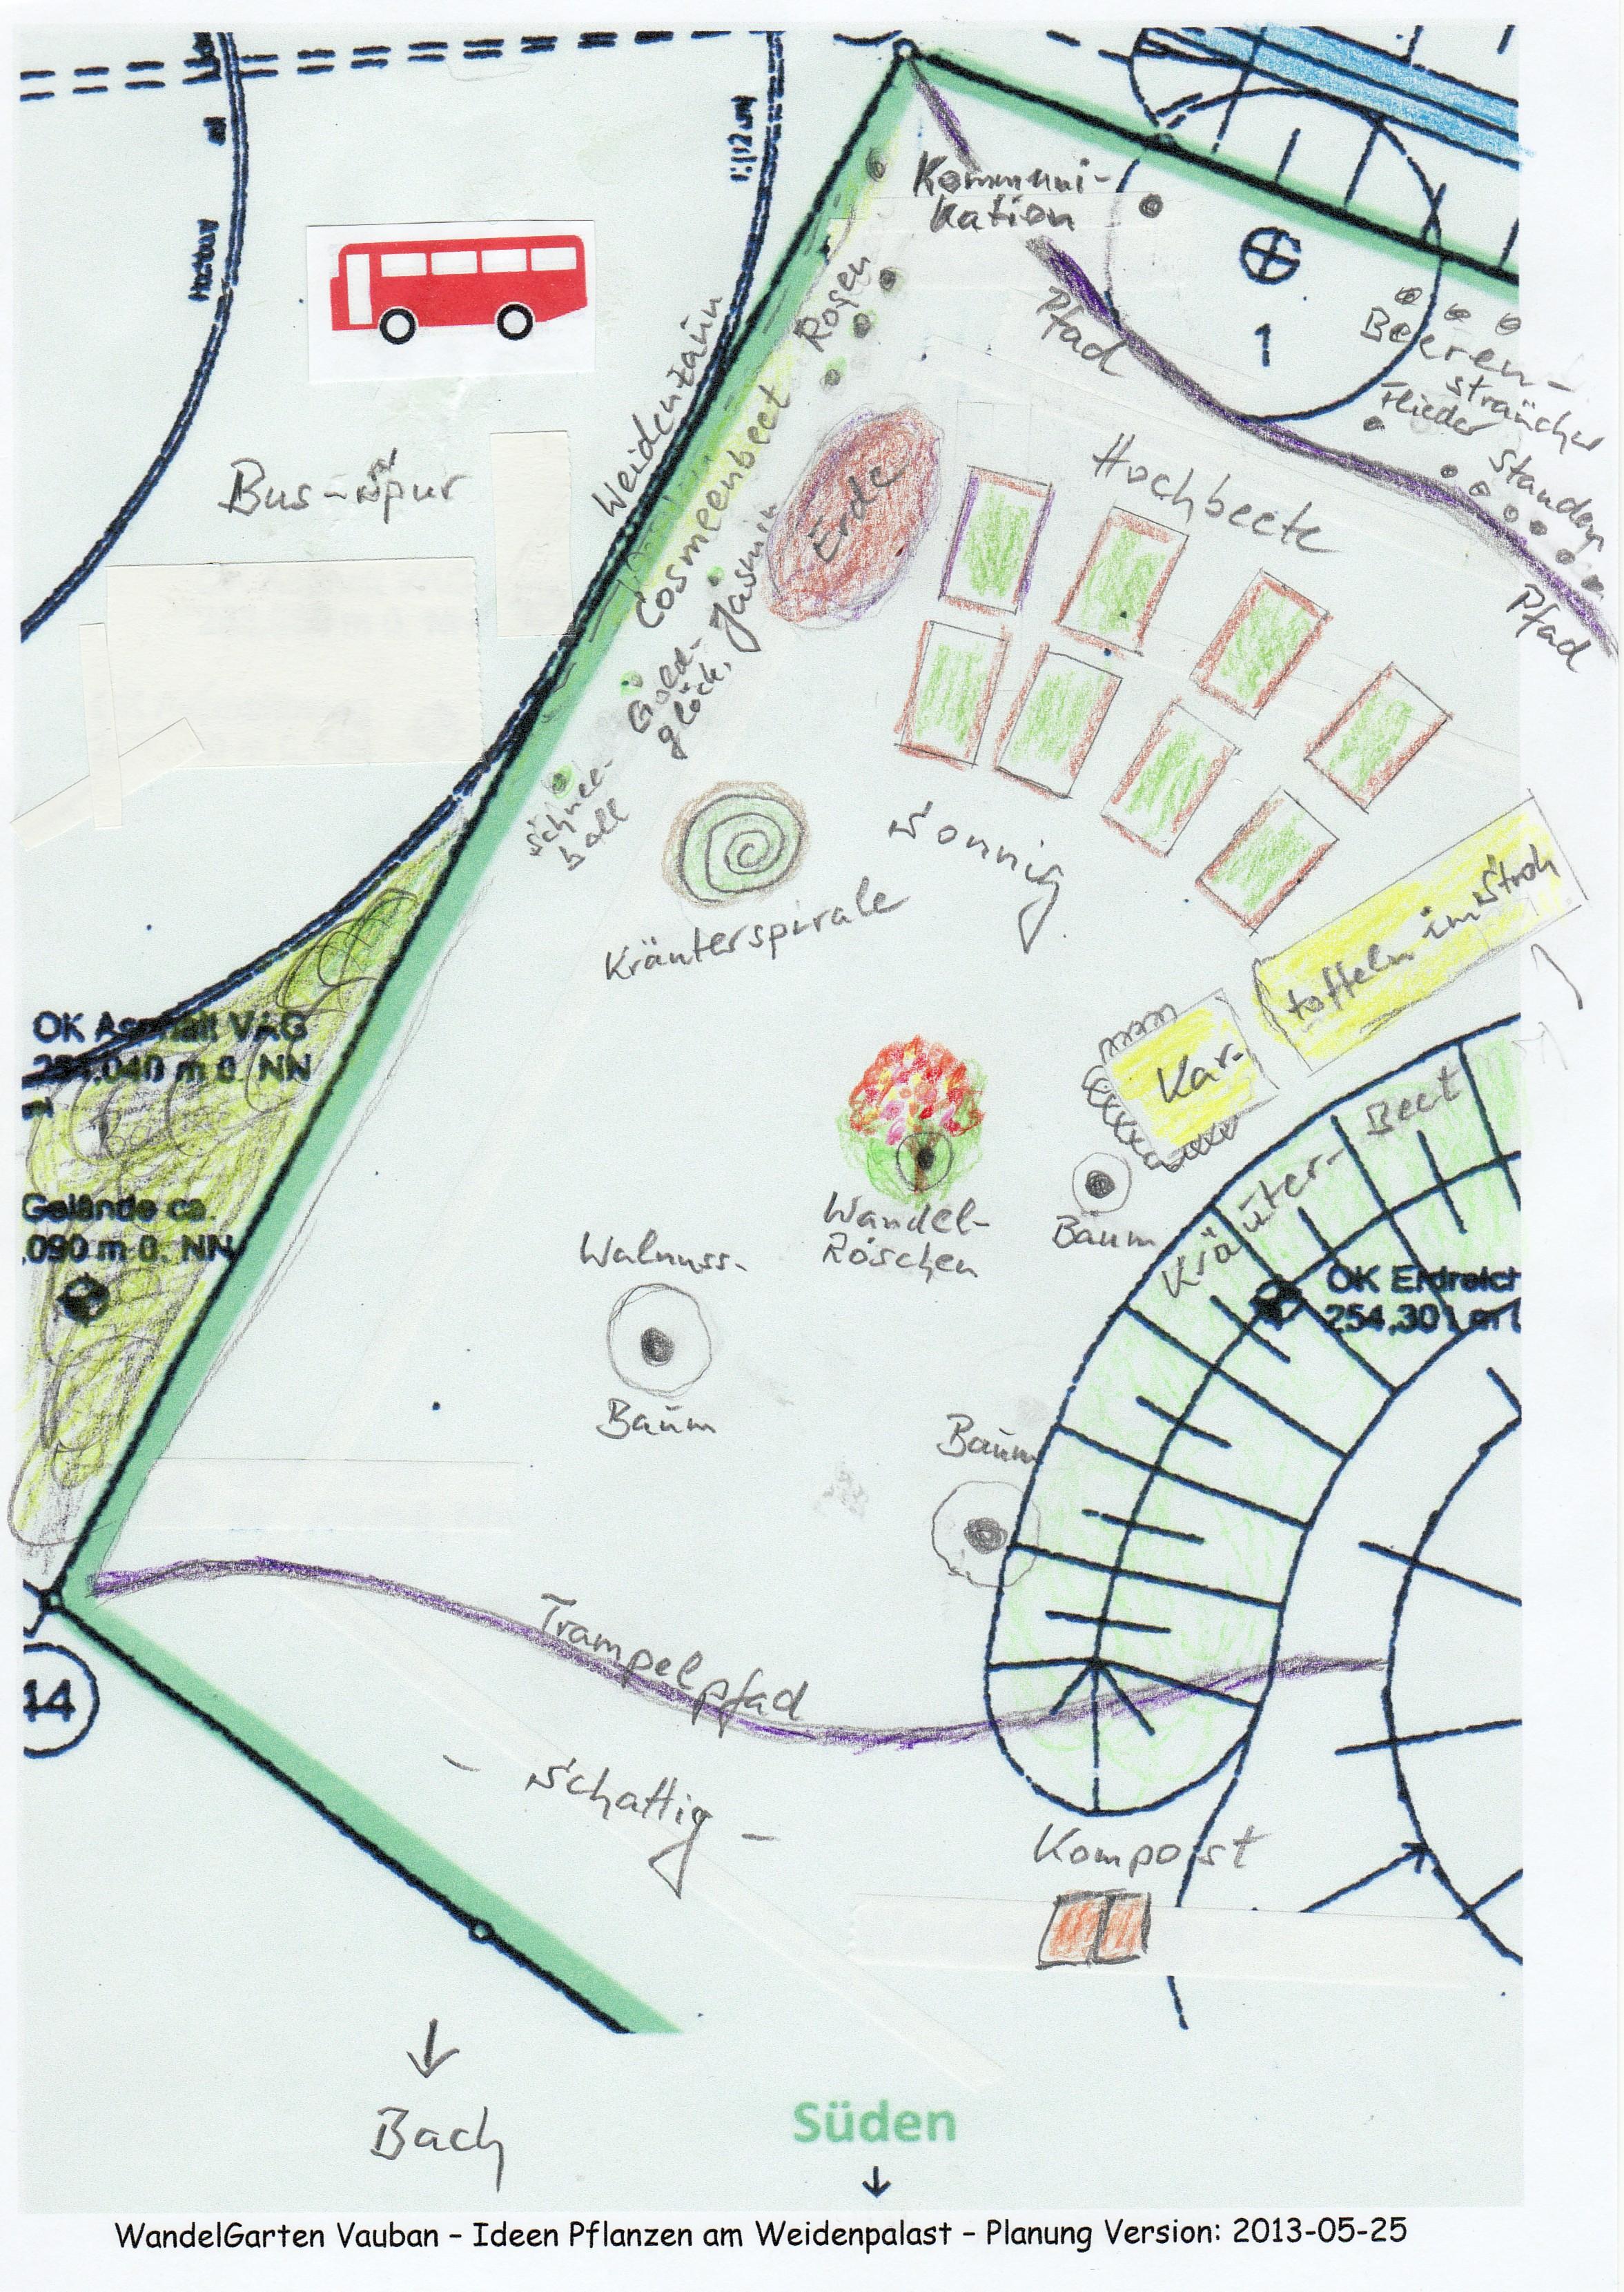 Wandelgarten Plan Stand 2013-05-25